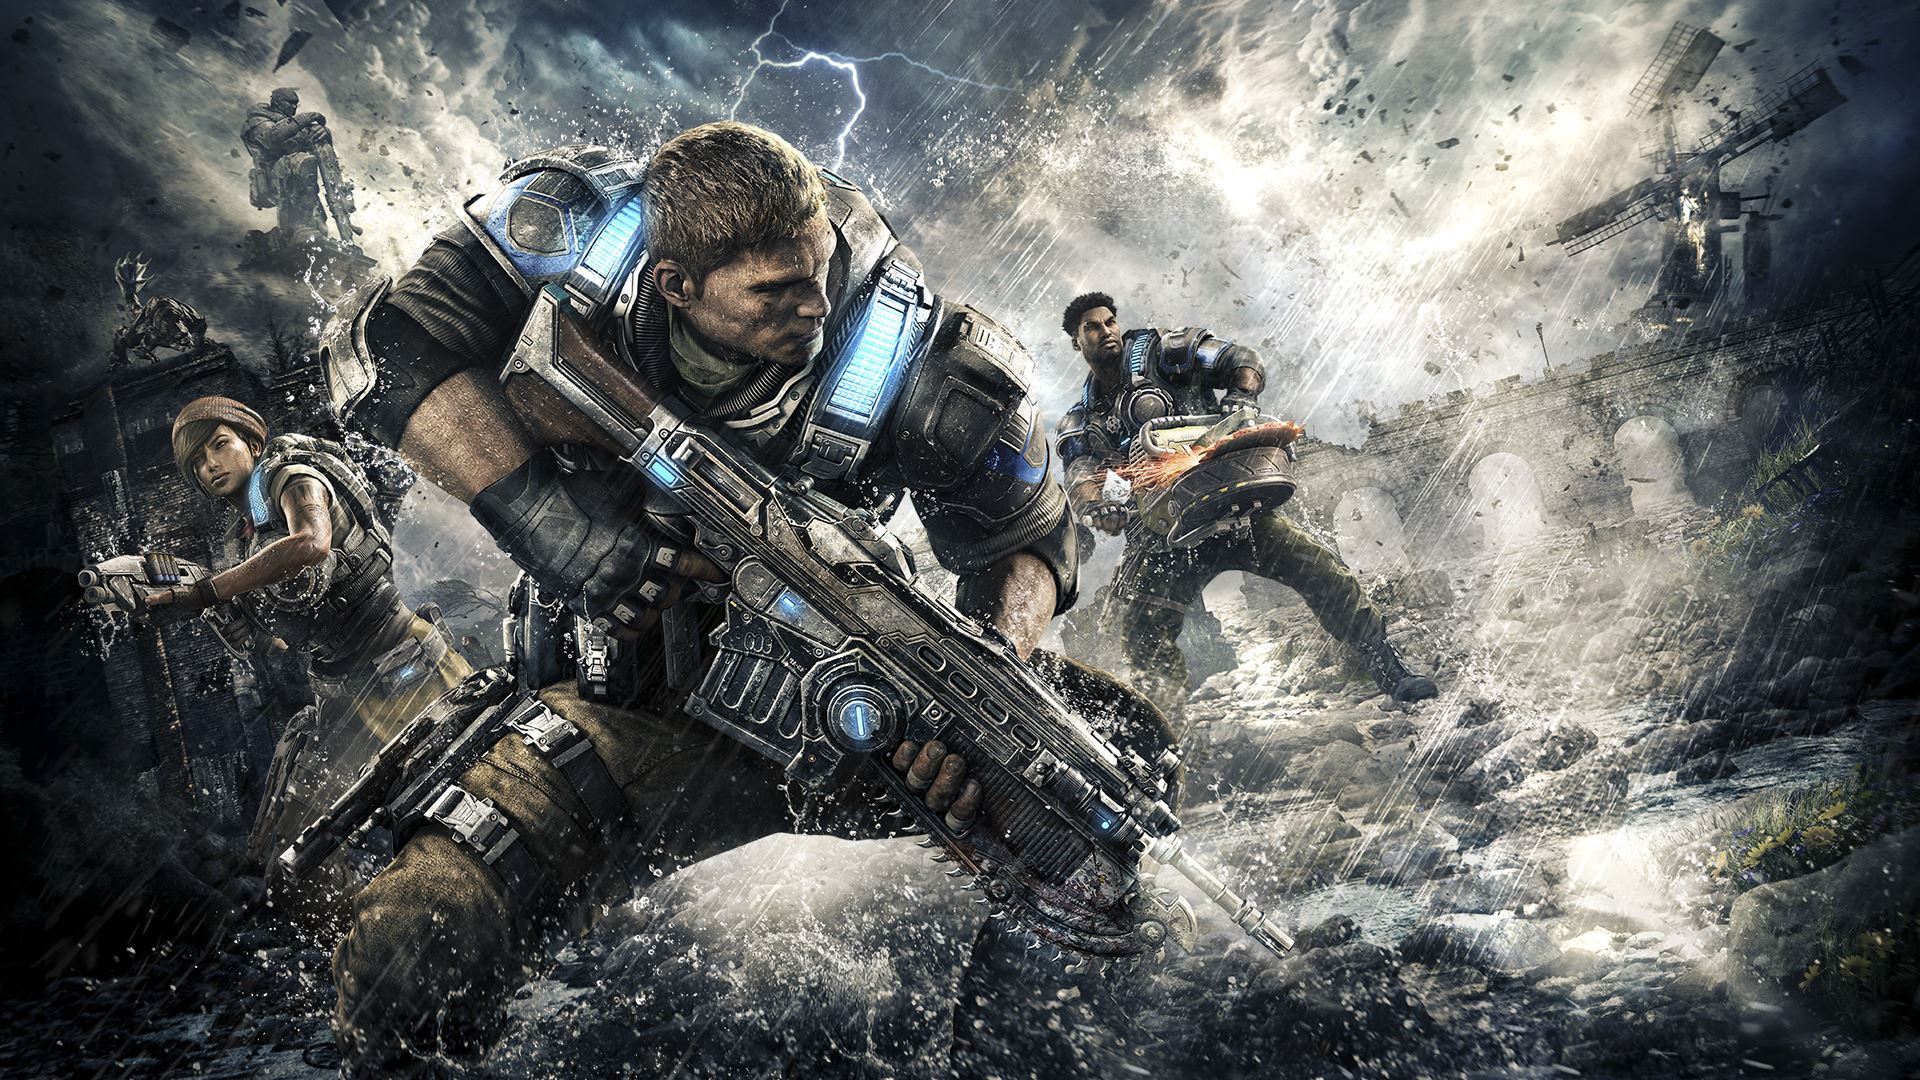 gears-of-war-4-campaign.jpg